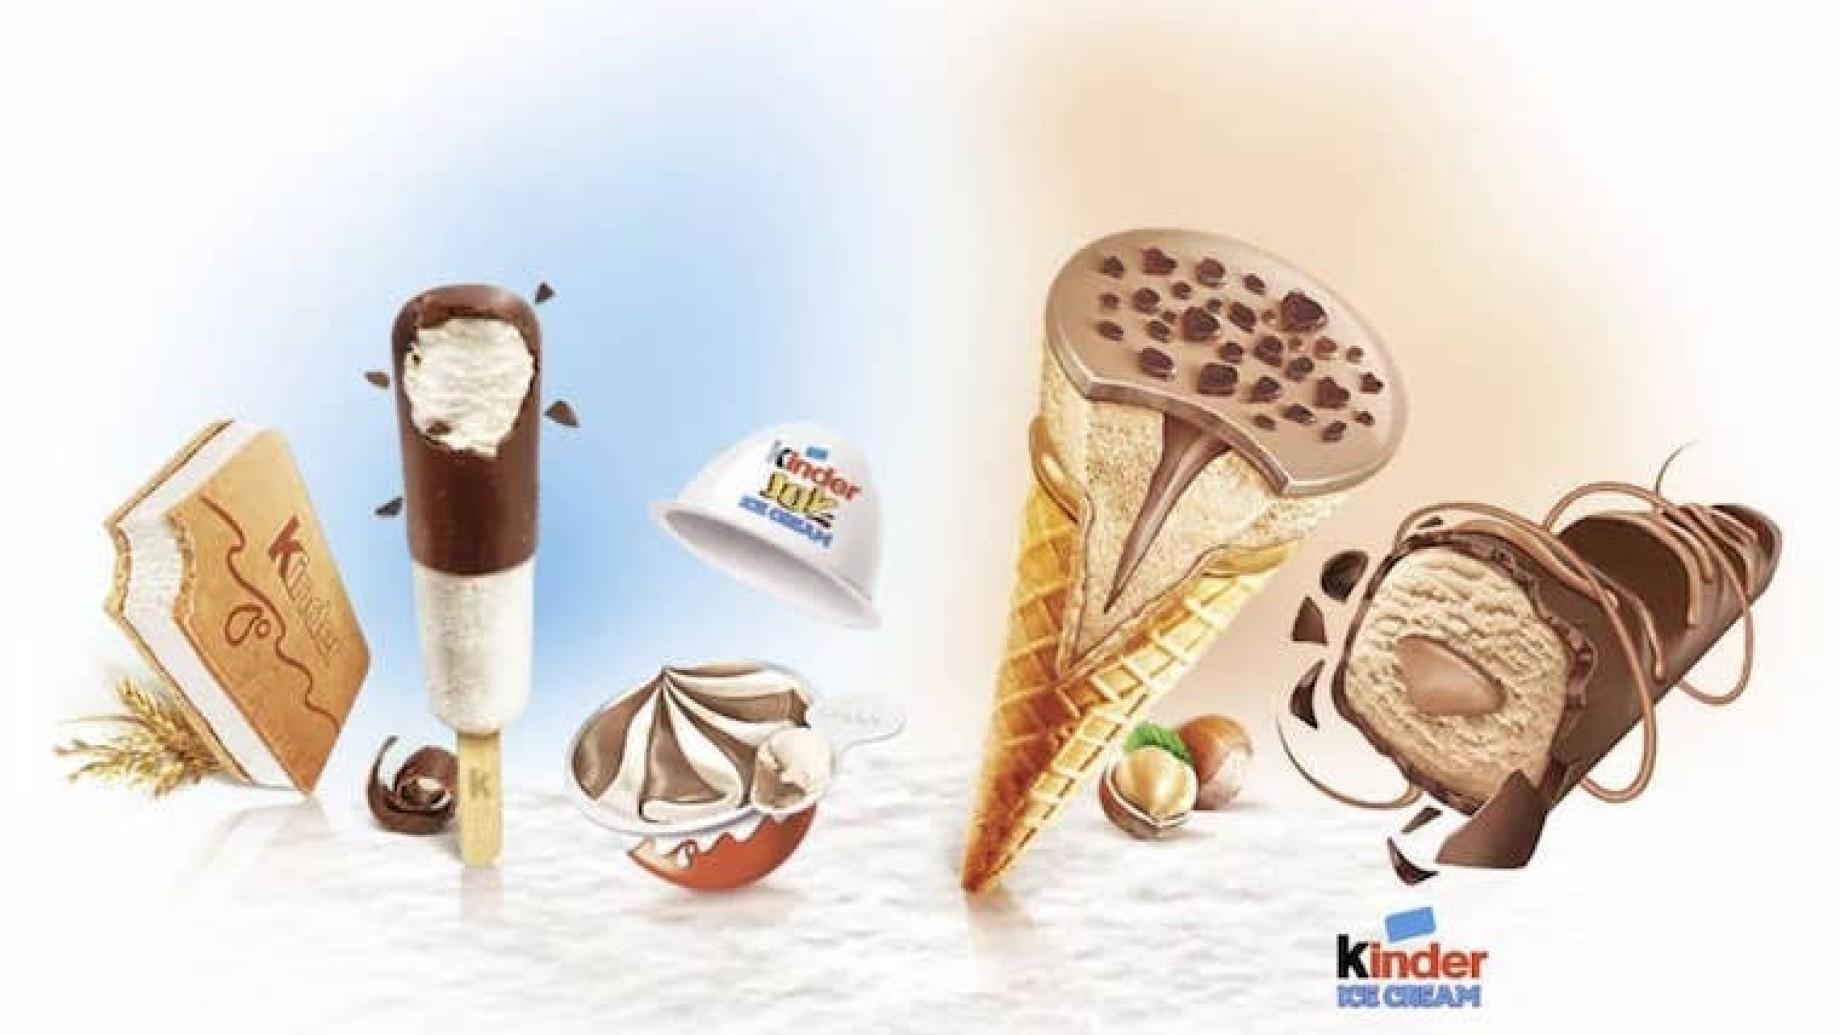 gelati-kinder-italia-marzo